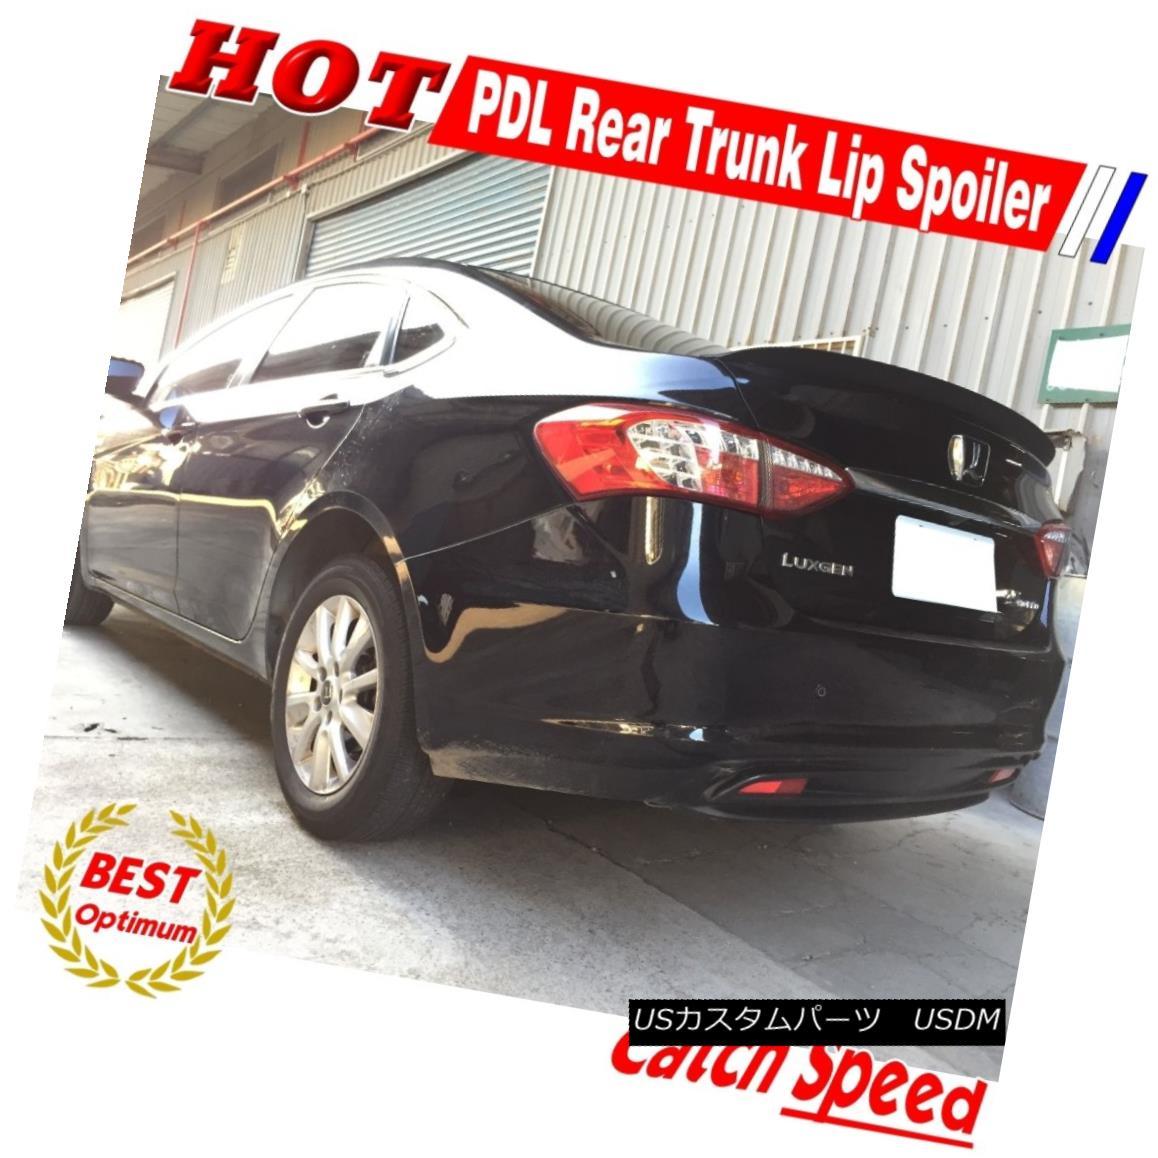 Painted PDL Style Rear Trunk Lip Spoiler Wing For Honda Accord K13 Sedan 2008-12